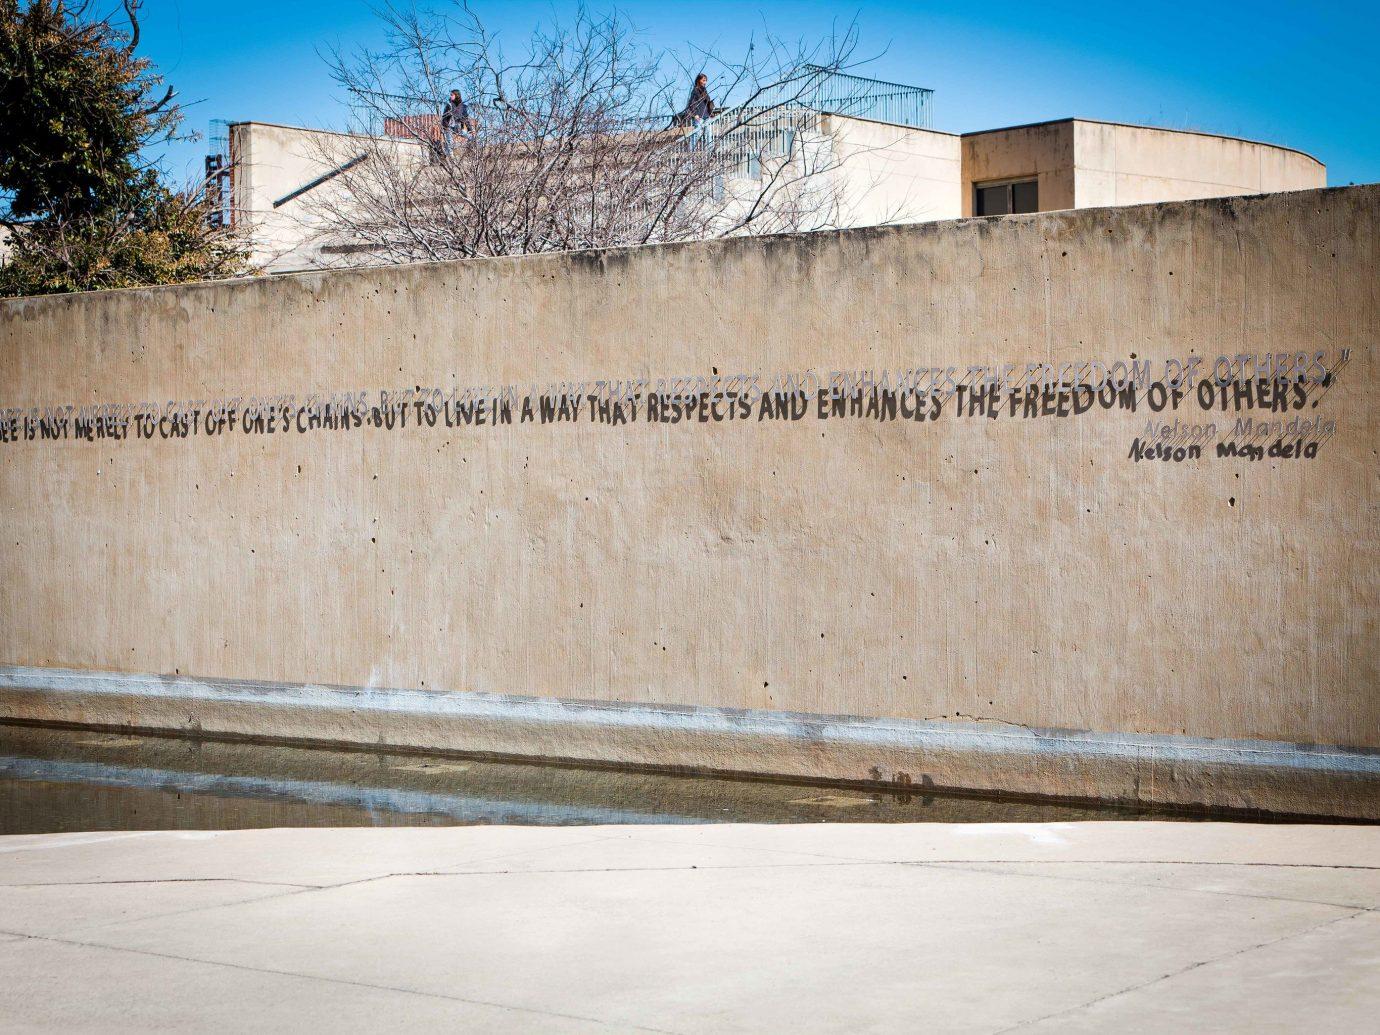 Arts + Culture Trip Ideas building outdoor wall Architecture facade sky concrete cement memorial step stone